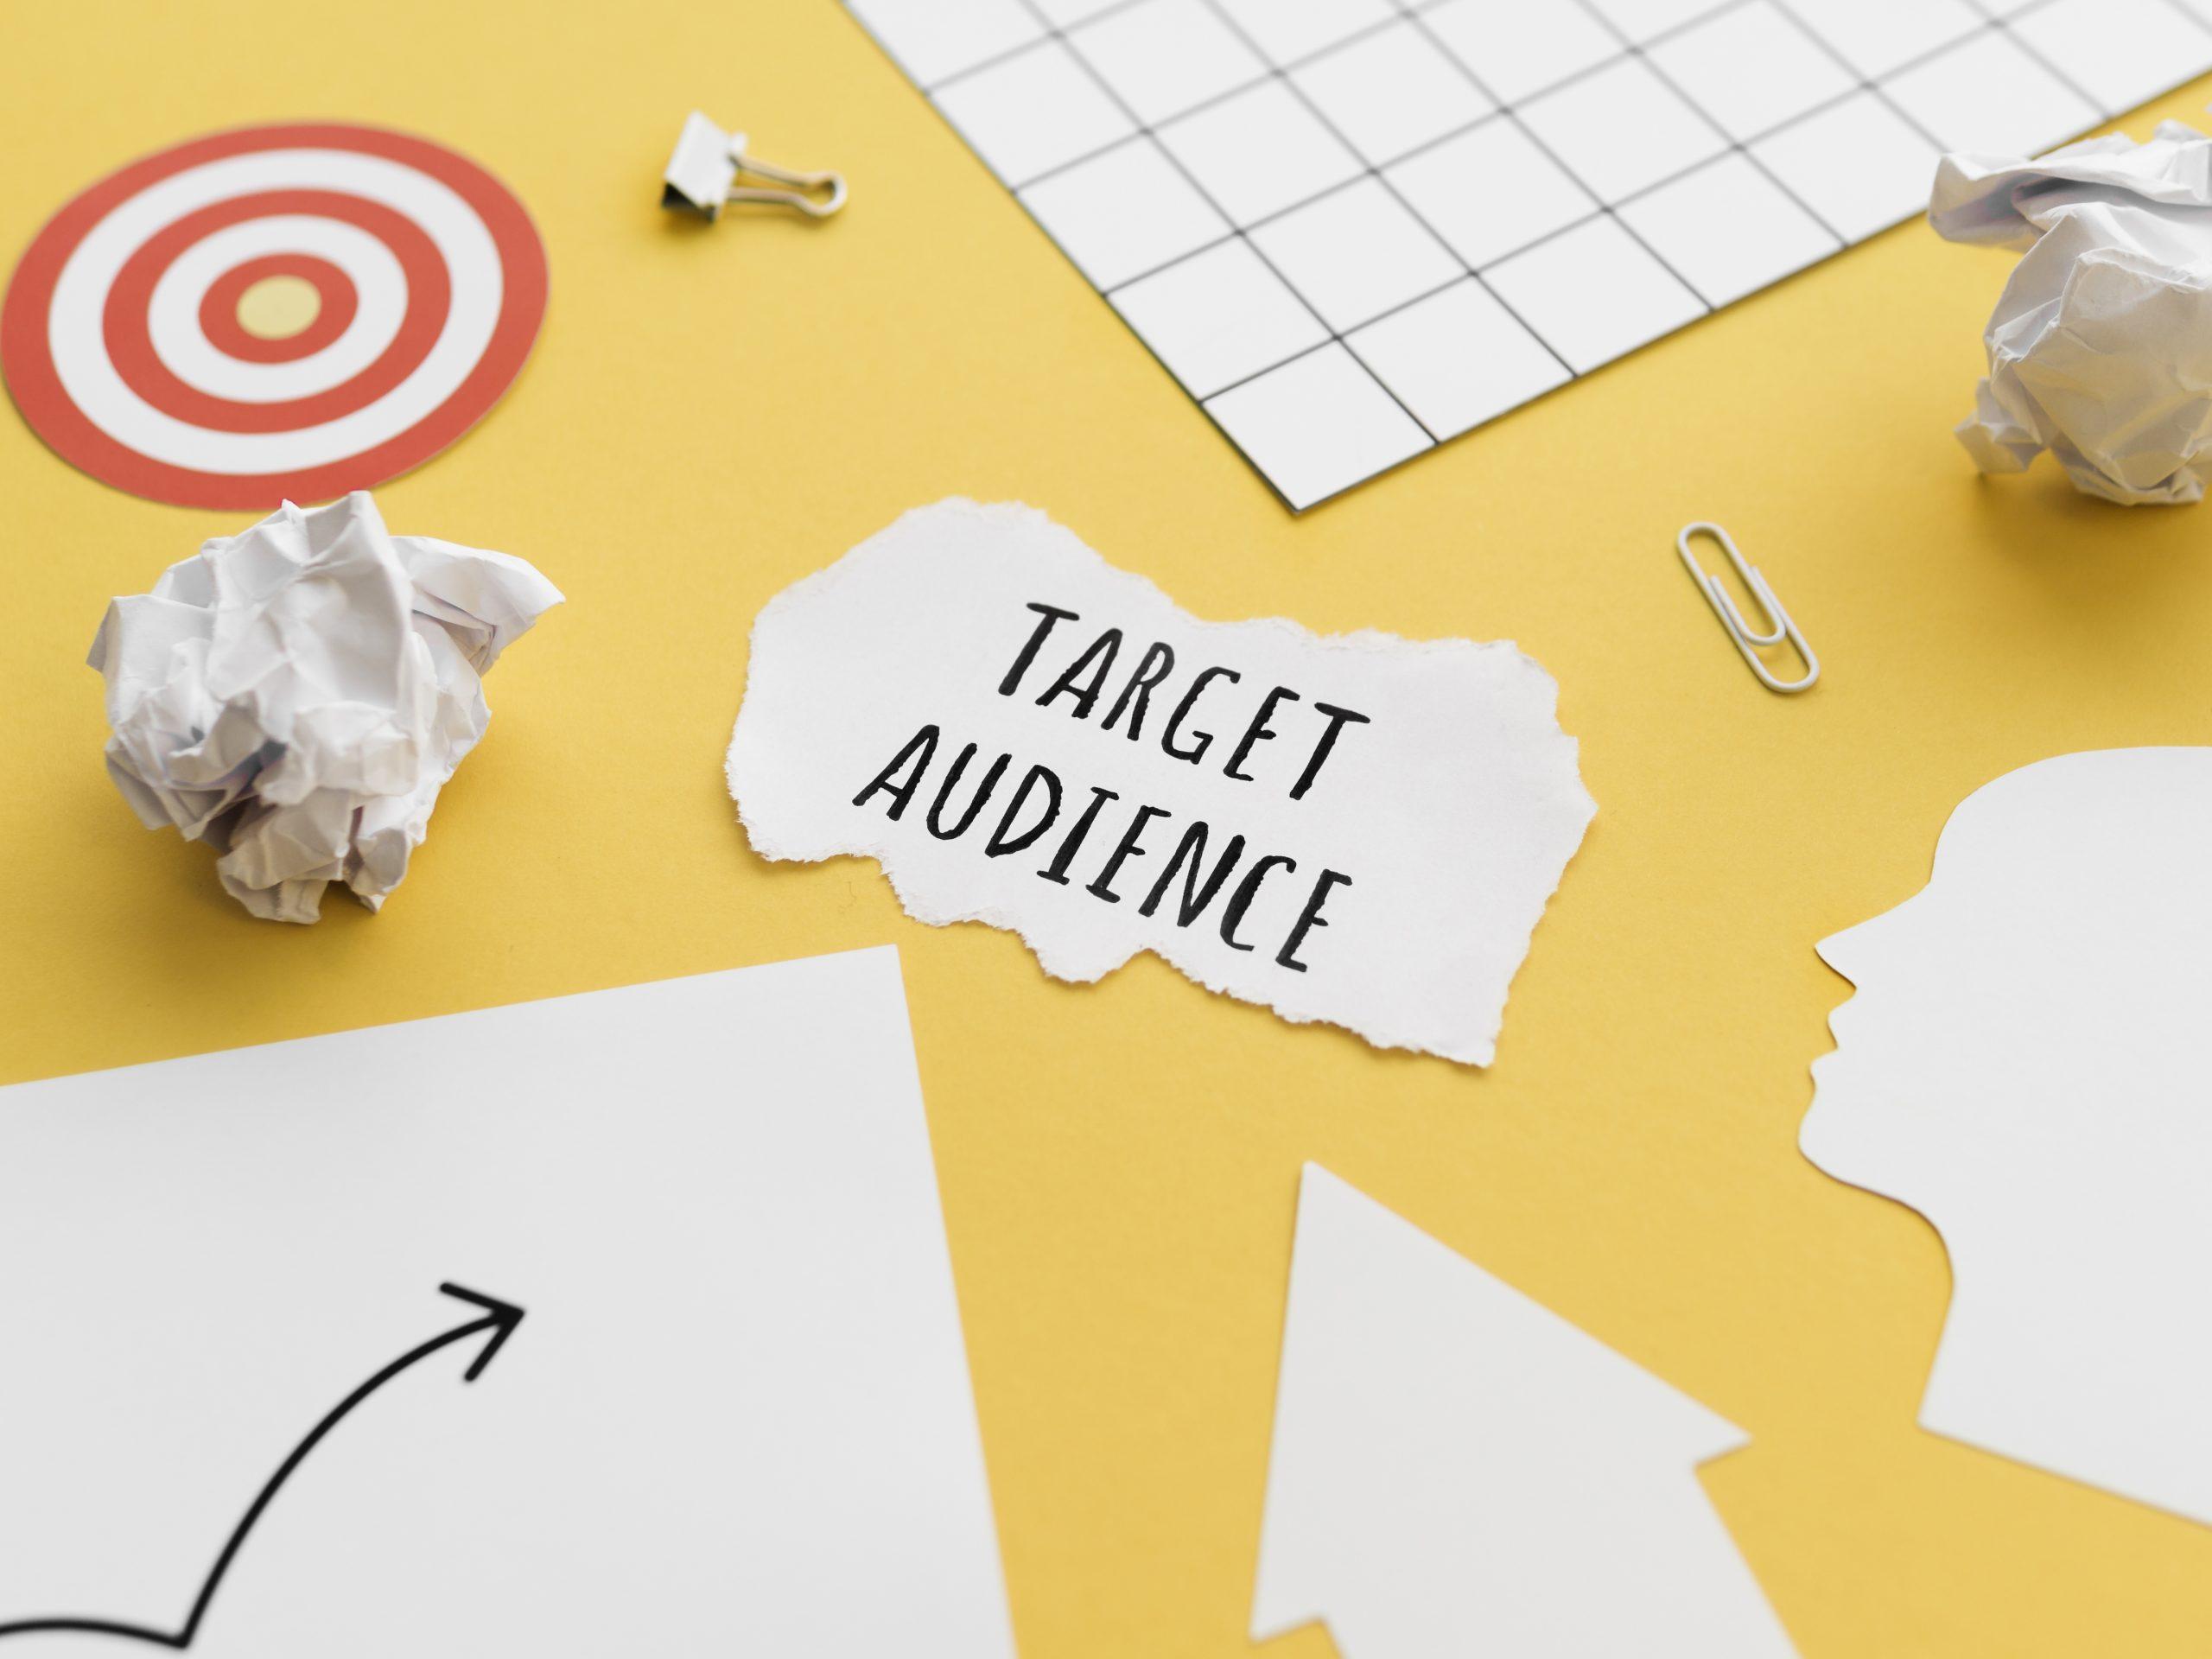 Target Audiens (Sumber: Olympus Digital Camera/Freepik)